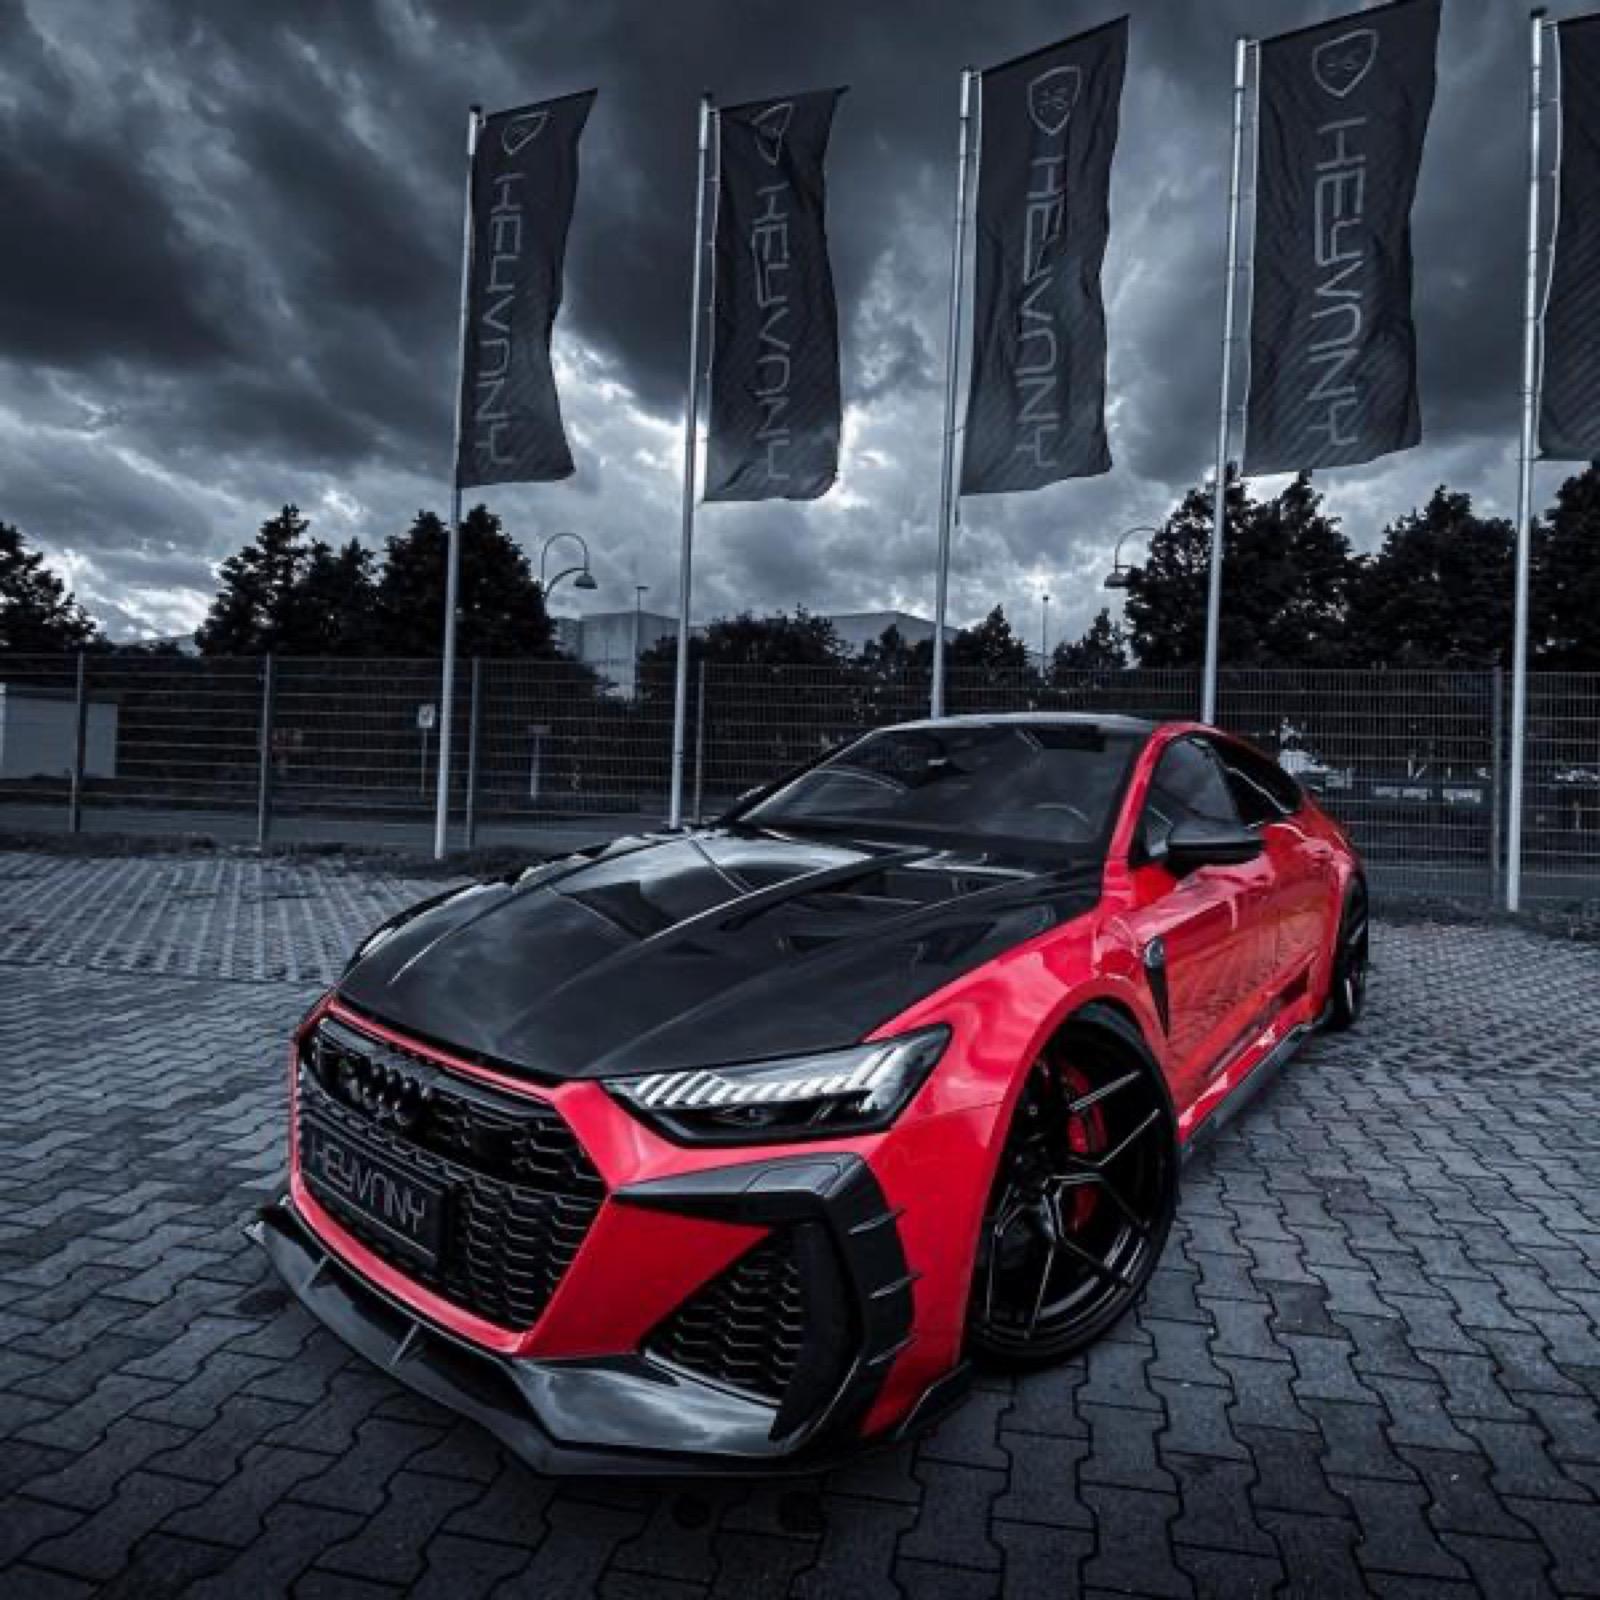 Audi-RS7-by-Keyvany-12